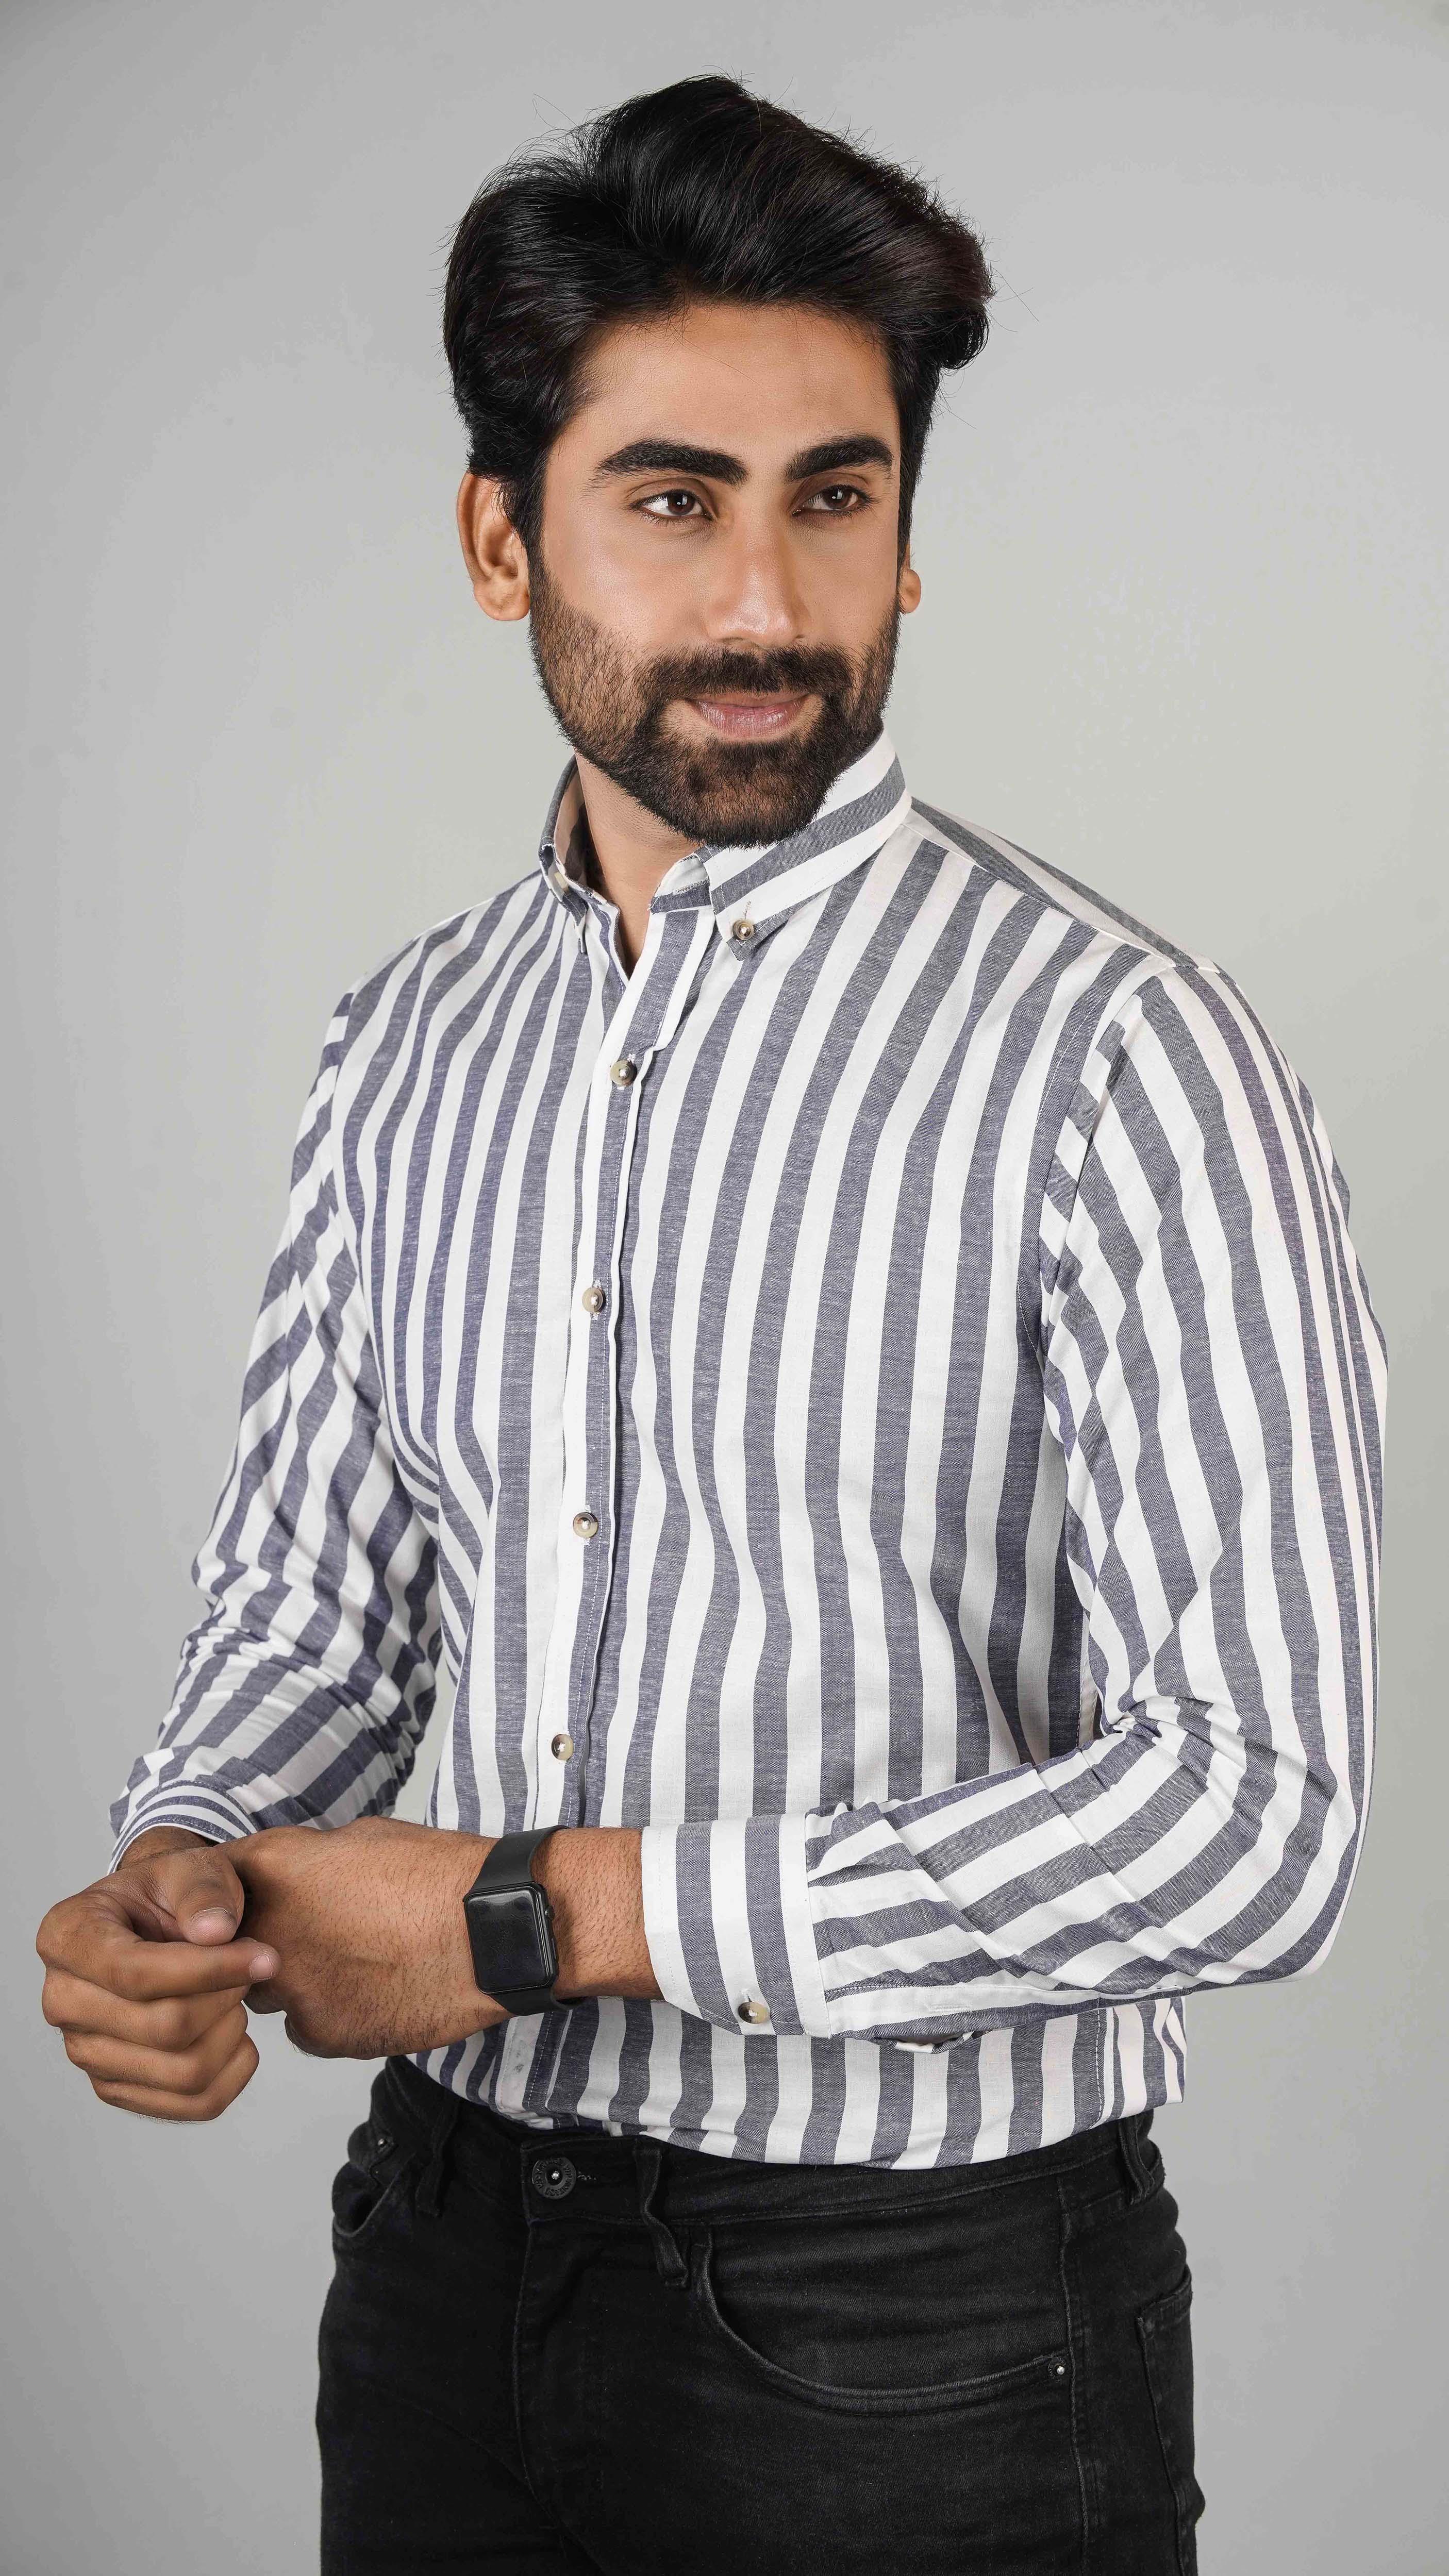 Code Casual Slim Fit Cotton Long Sleeve Black Printed Shirt For Men Fashion Sku: Cd-28